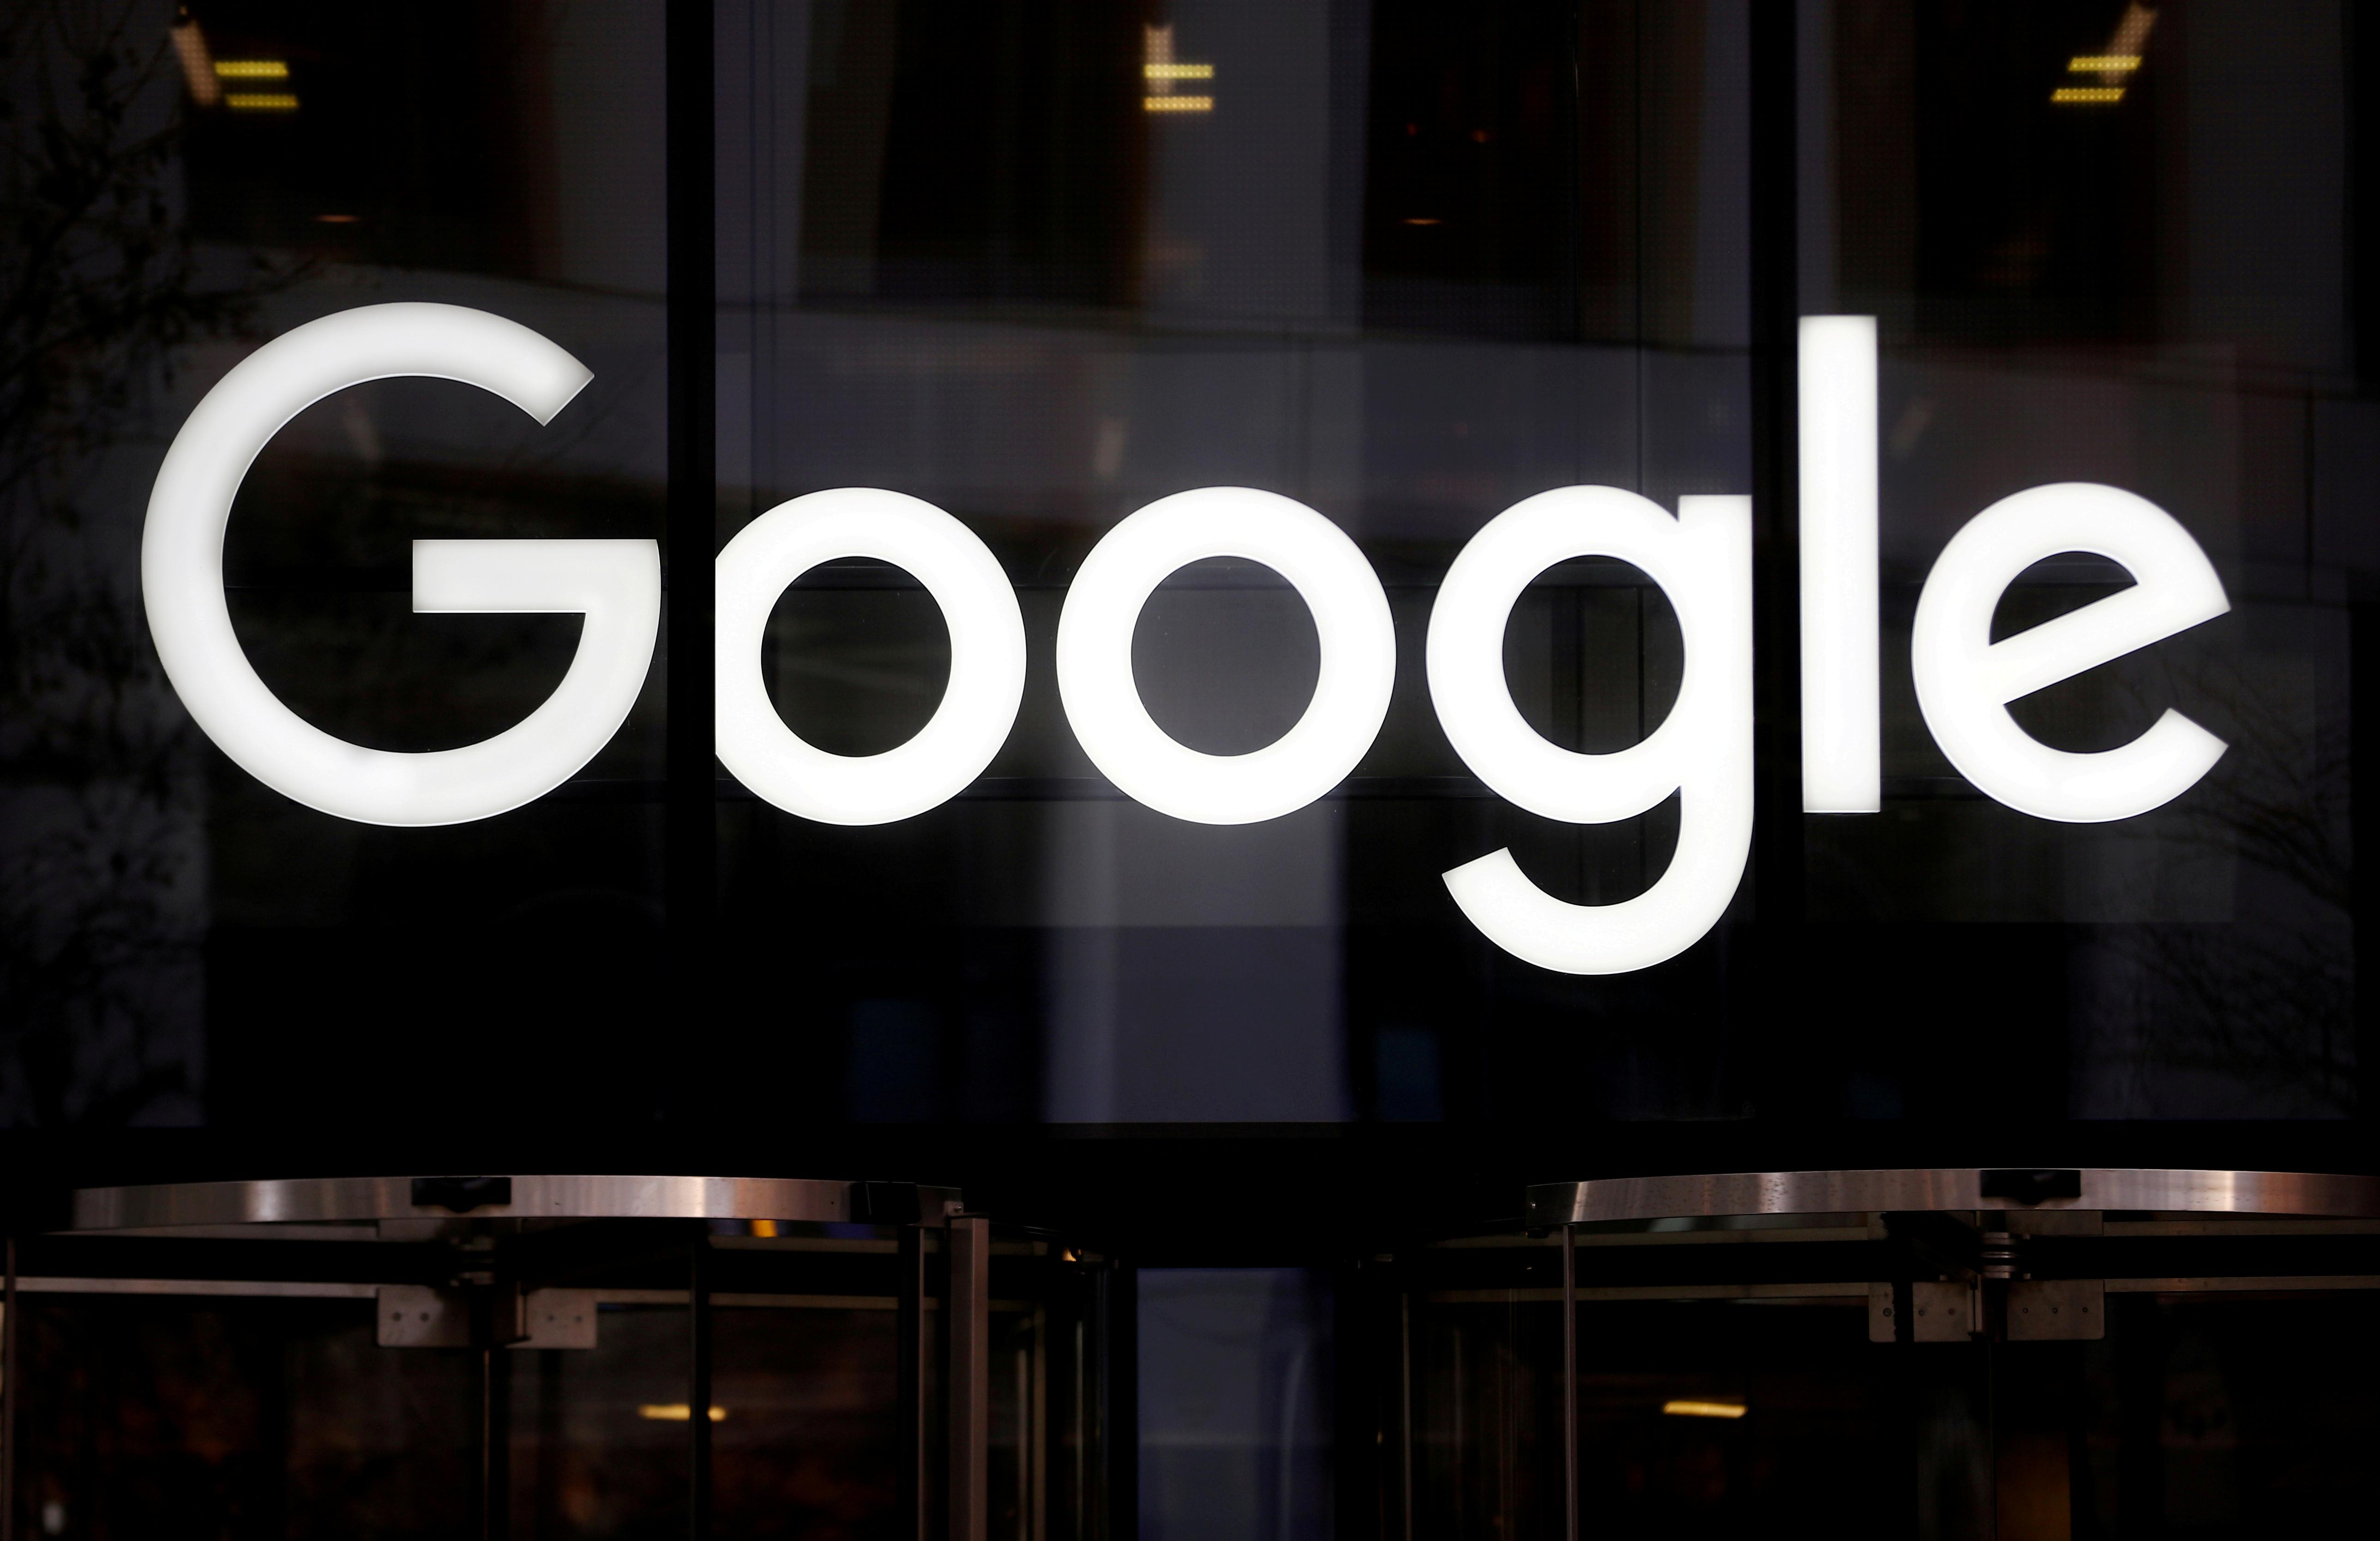 Google invests $1 billion to ease housing shortage near California headquarters